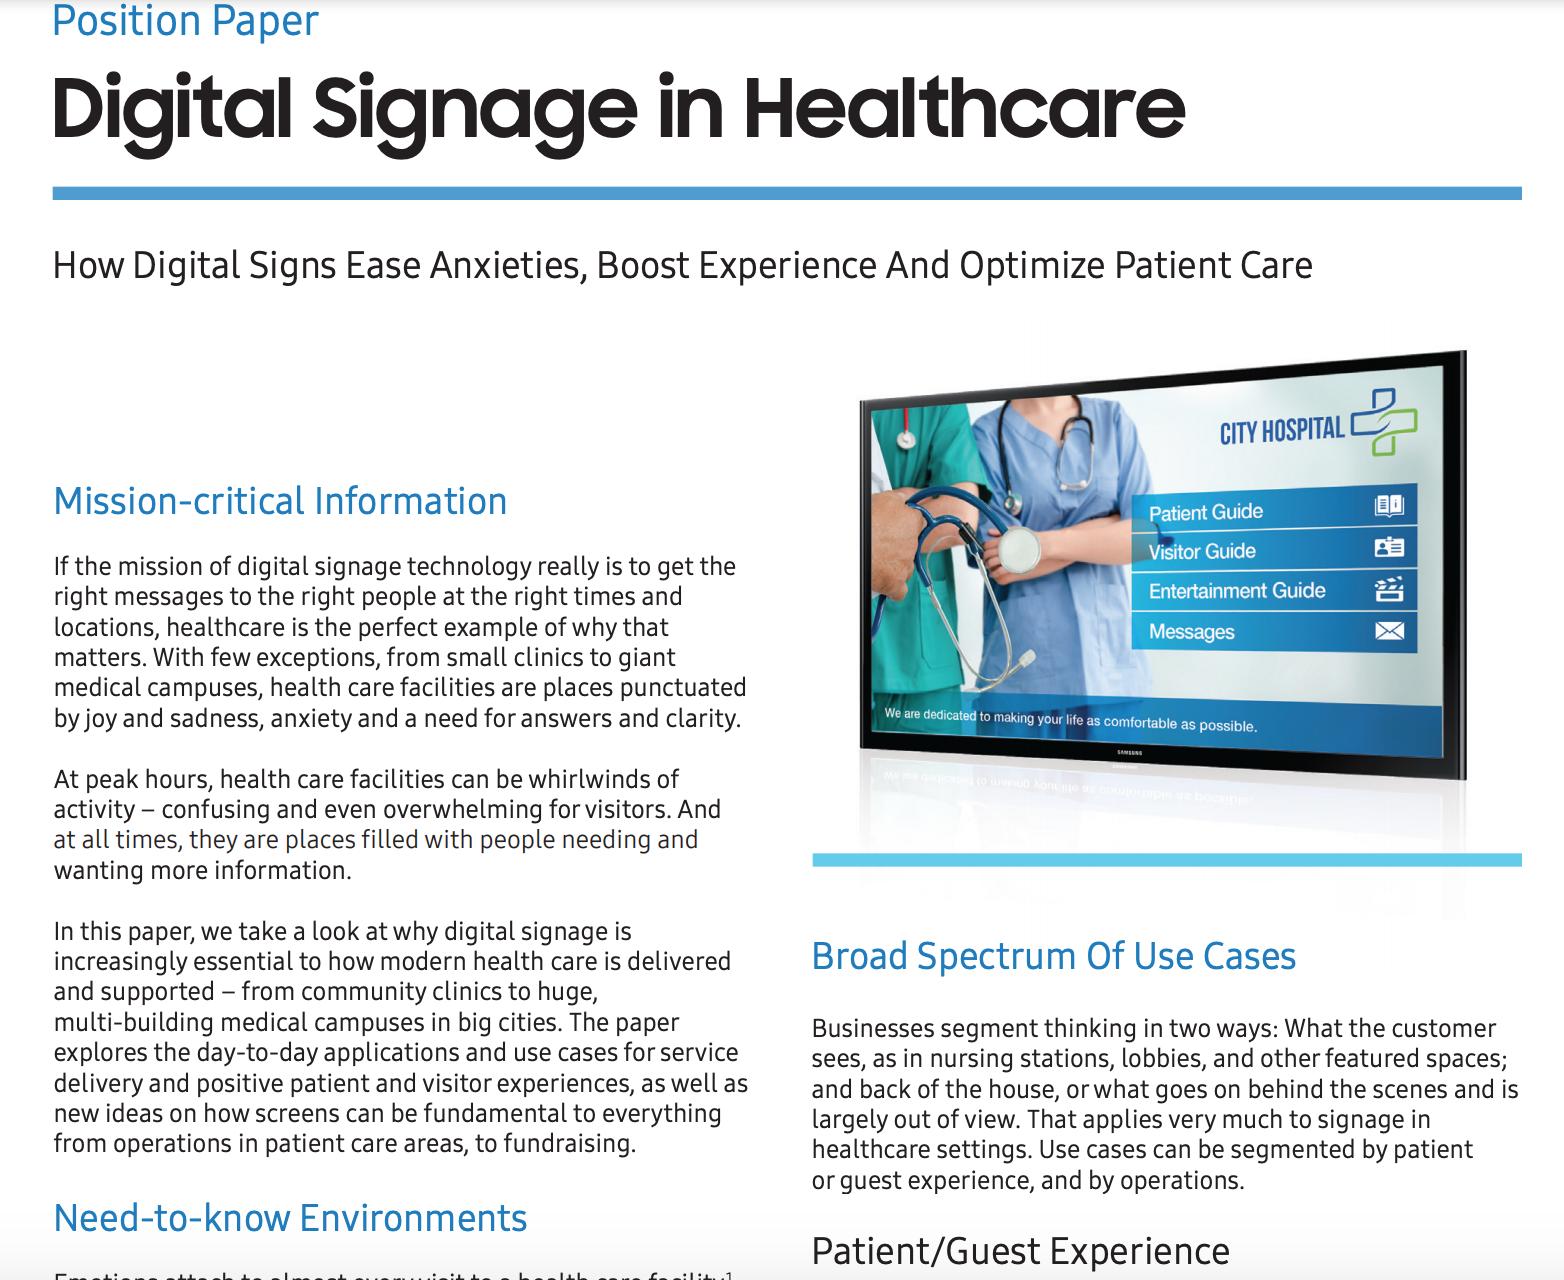 Digital Signage in Healthcare